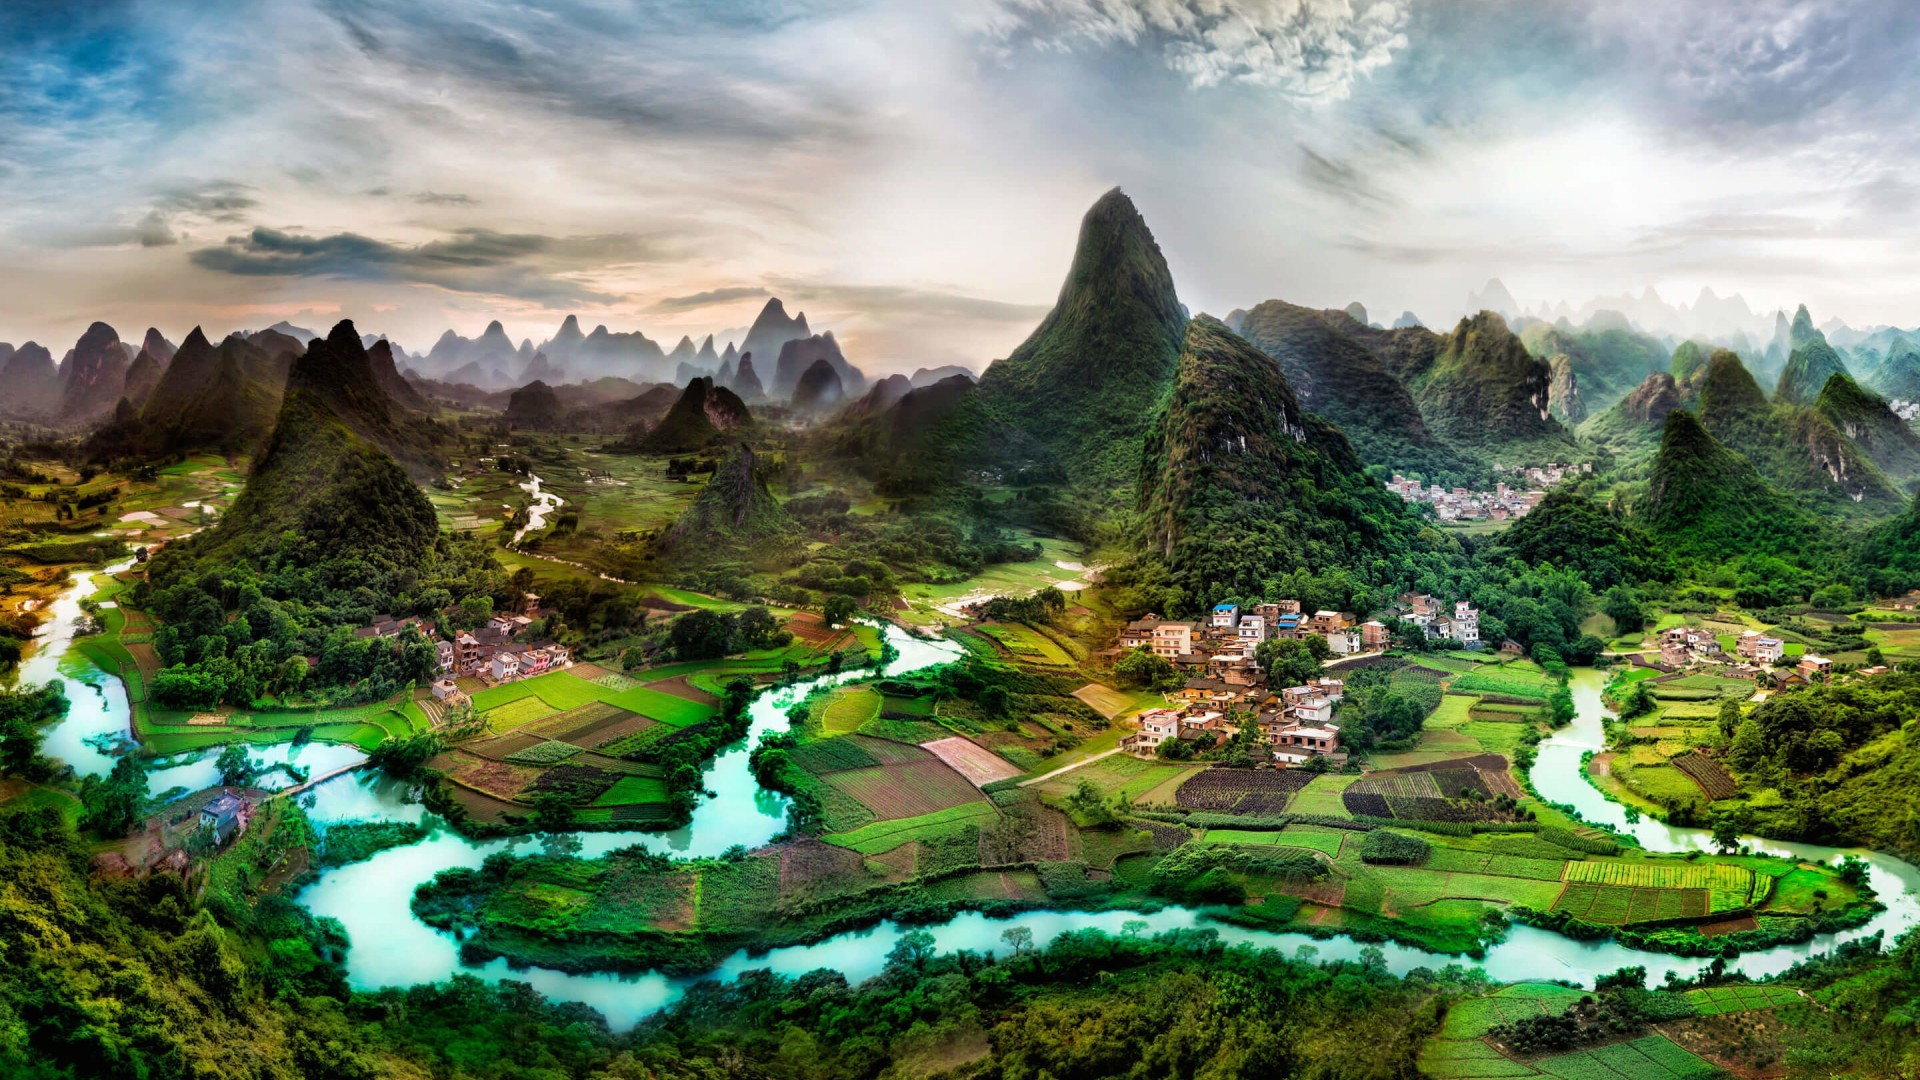 General 1920x1080 water nature Li River China landscape mountains